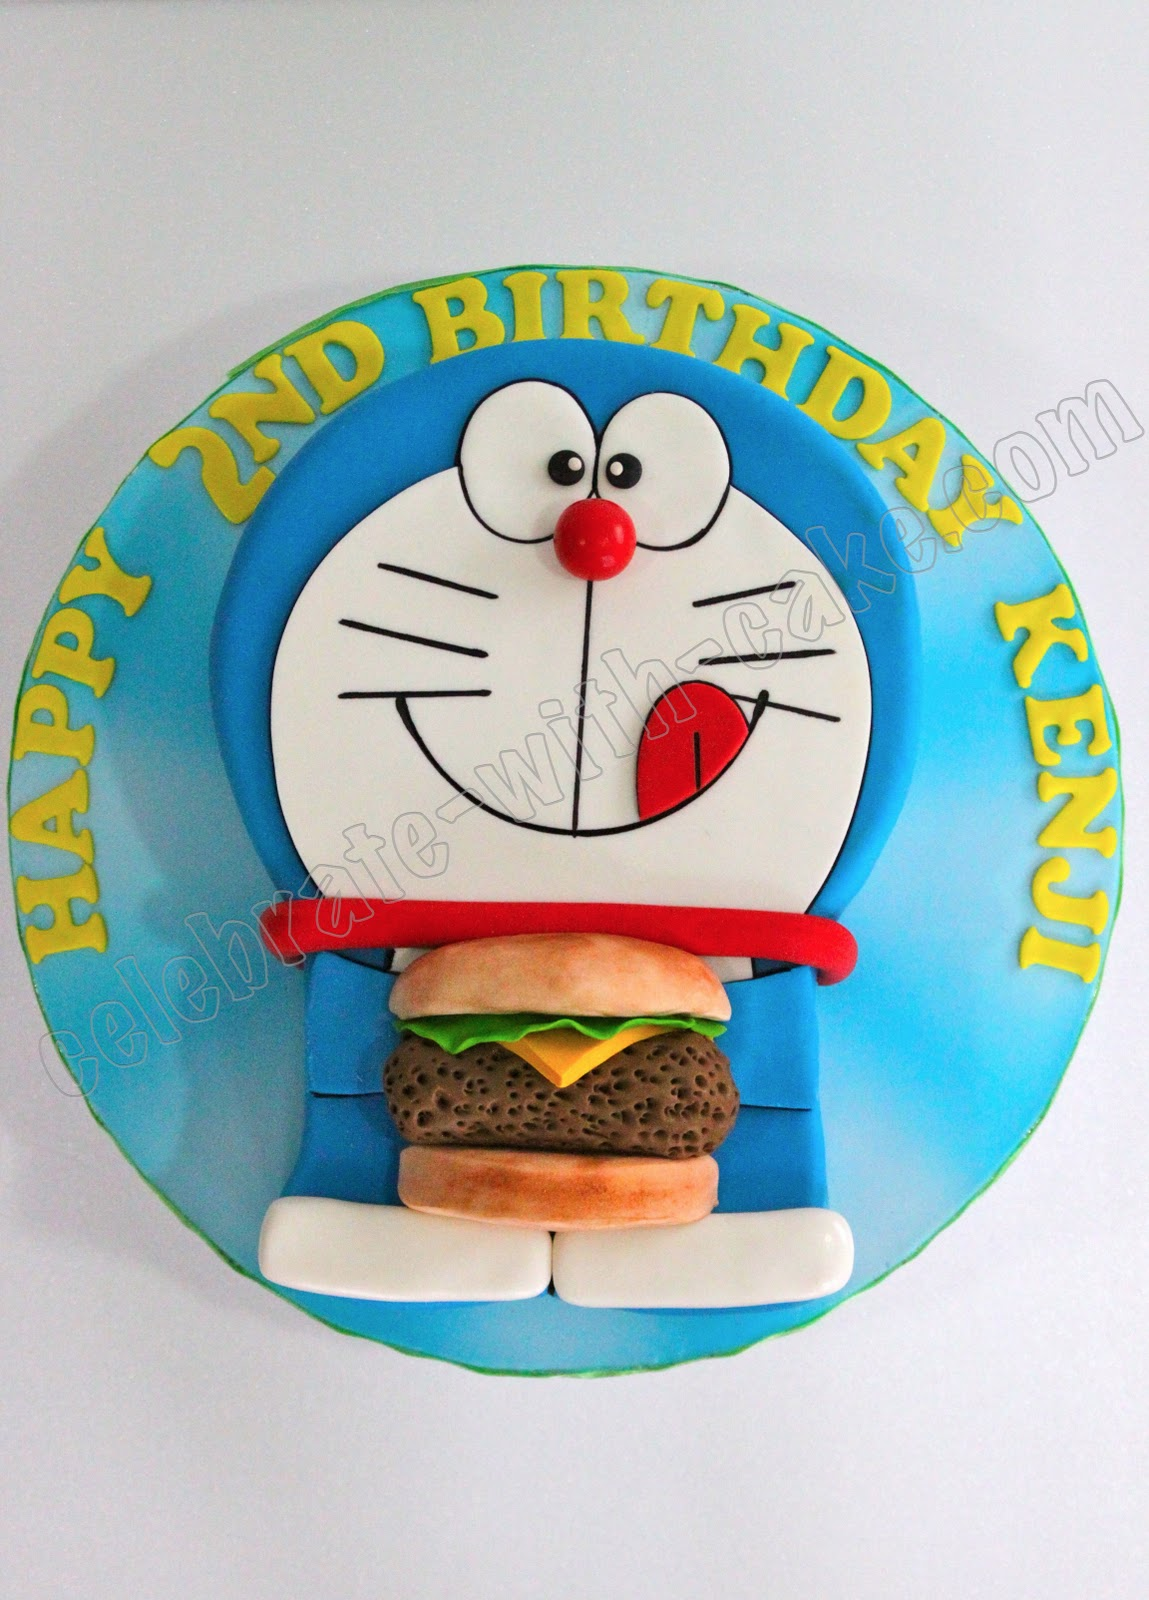 Cake Design Doraemon : Celebrate with Cake!: Doraemon Cake